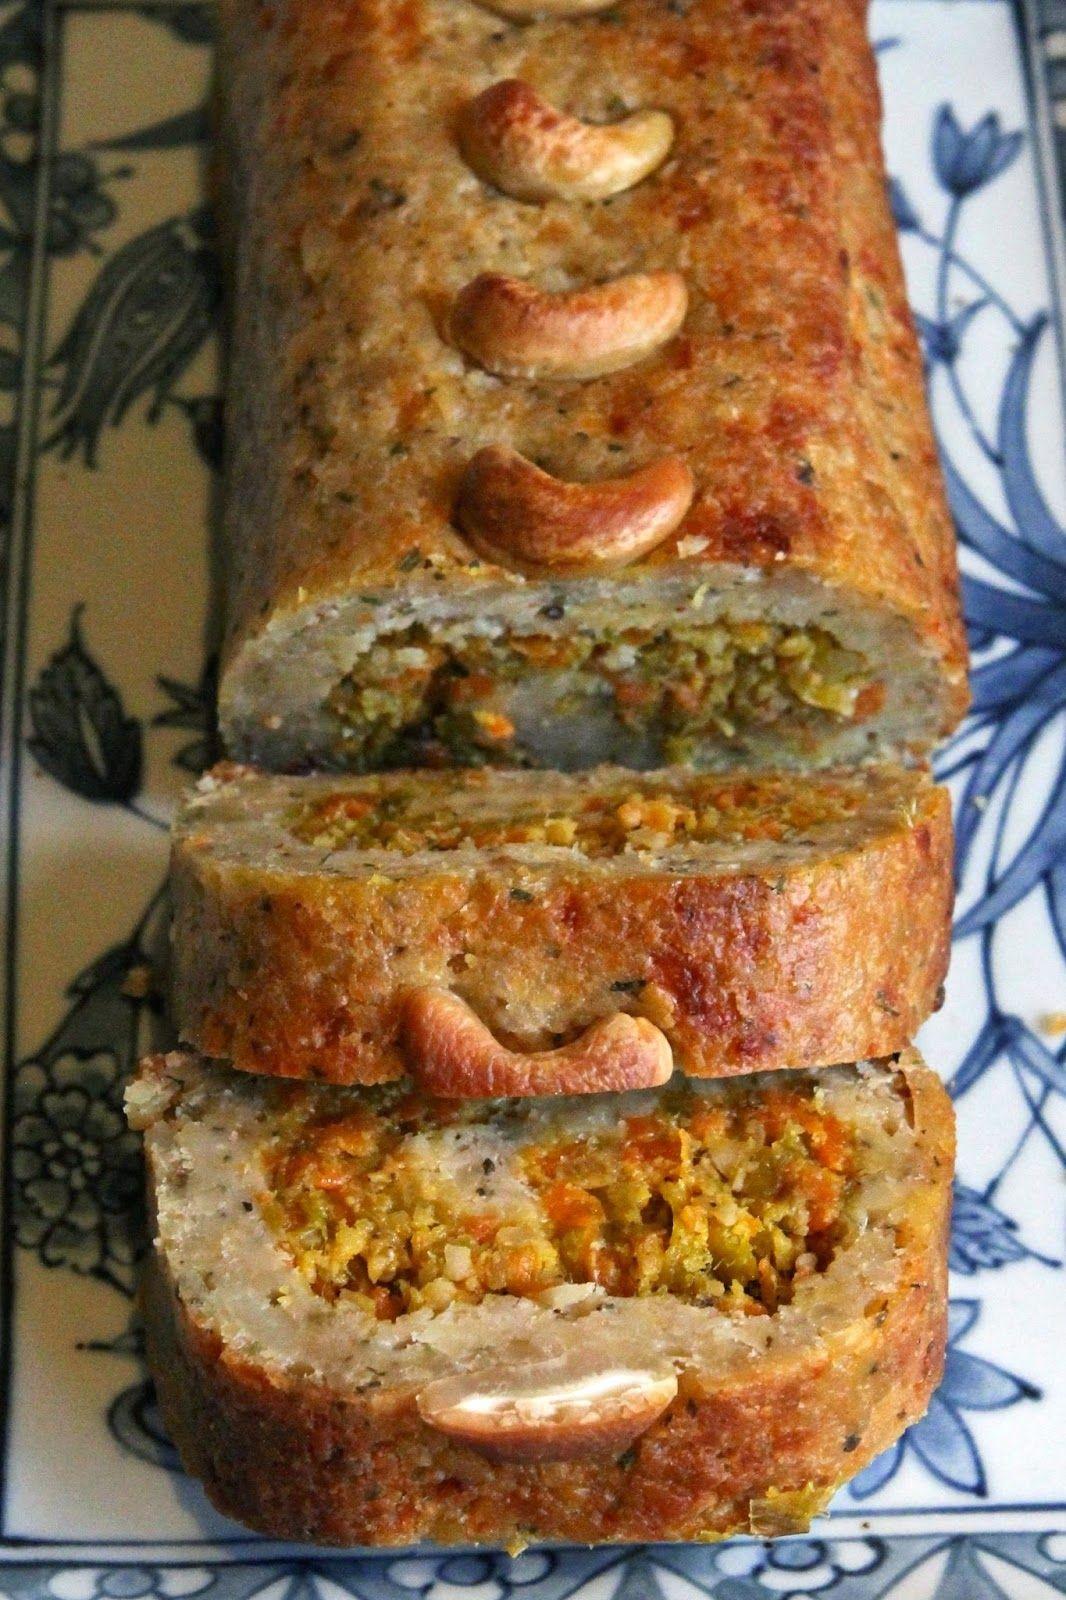 Gluten Free Alchemist: Stuffed Cashew Nut Roast